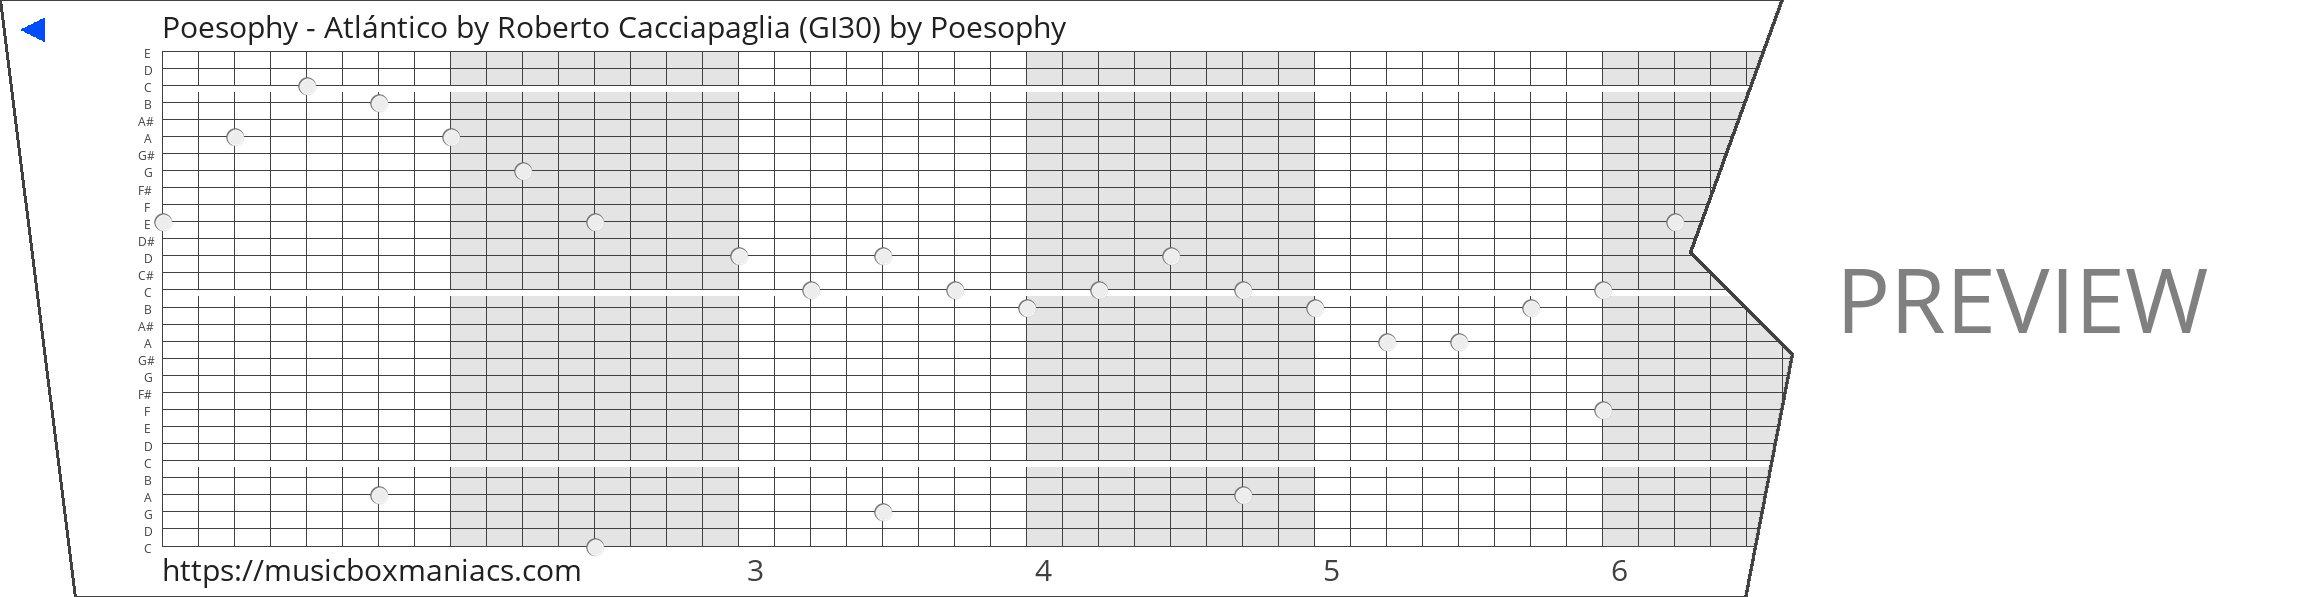 Poesophy - Atlántico by Roberto Cacciapaglia (GI30) 30 note music box paper strip